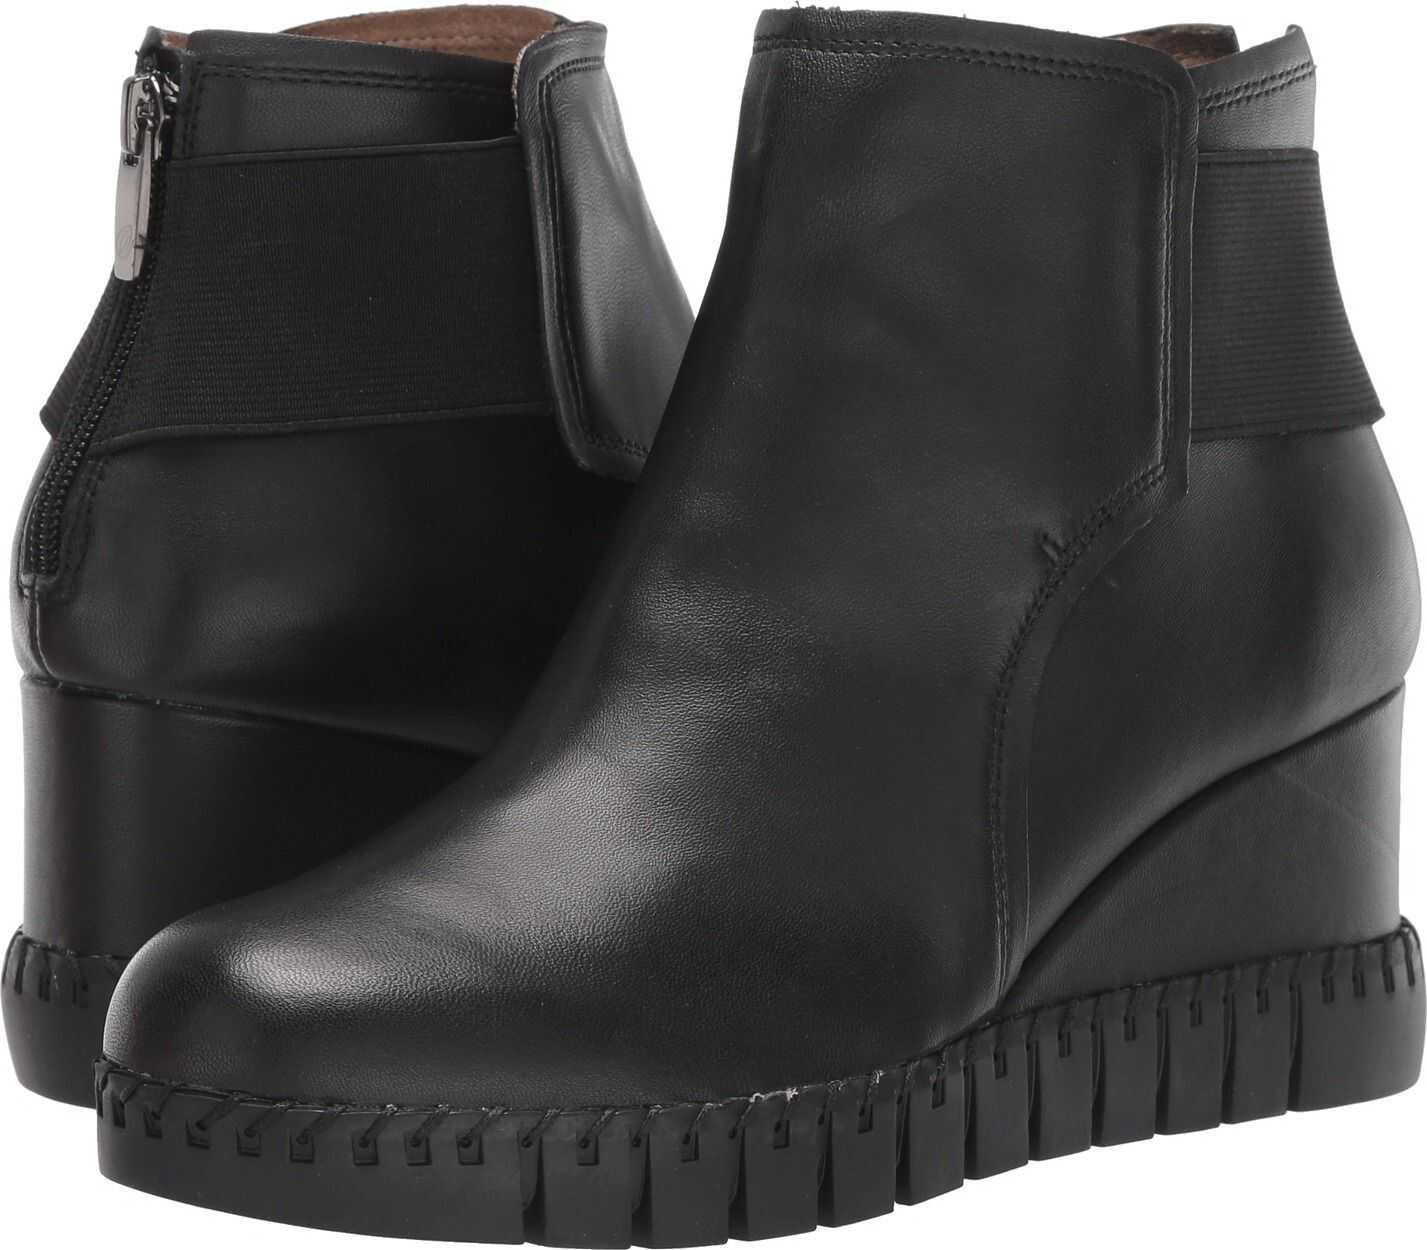 J. Renee Nagetta Black Leather